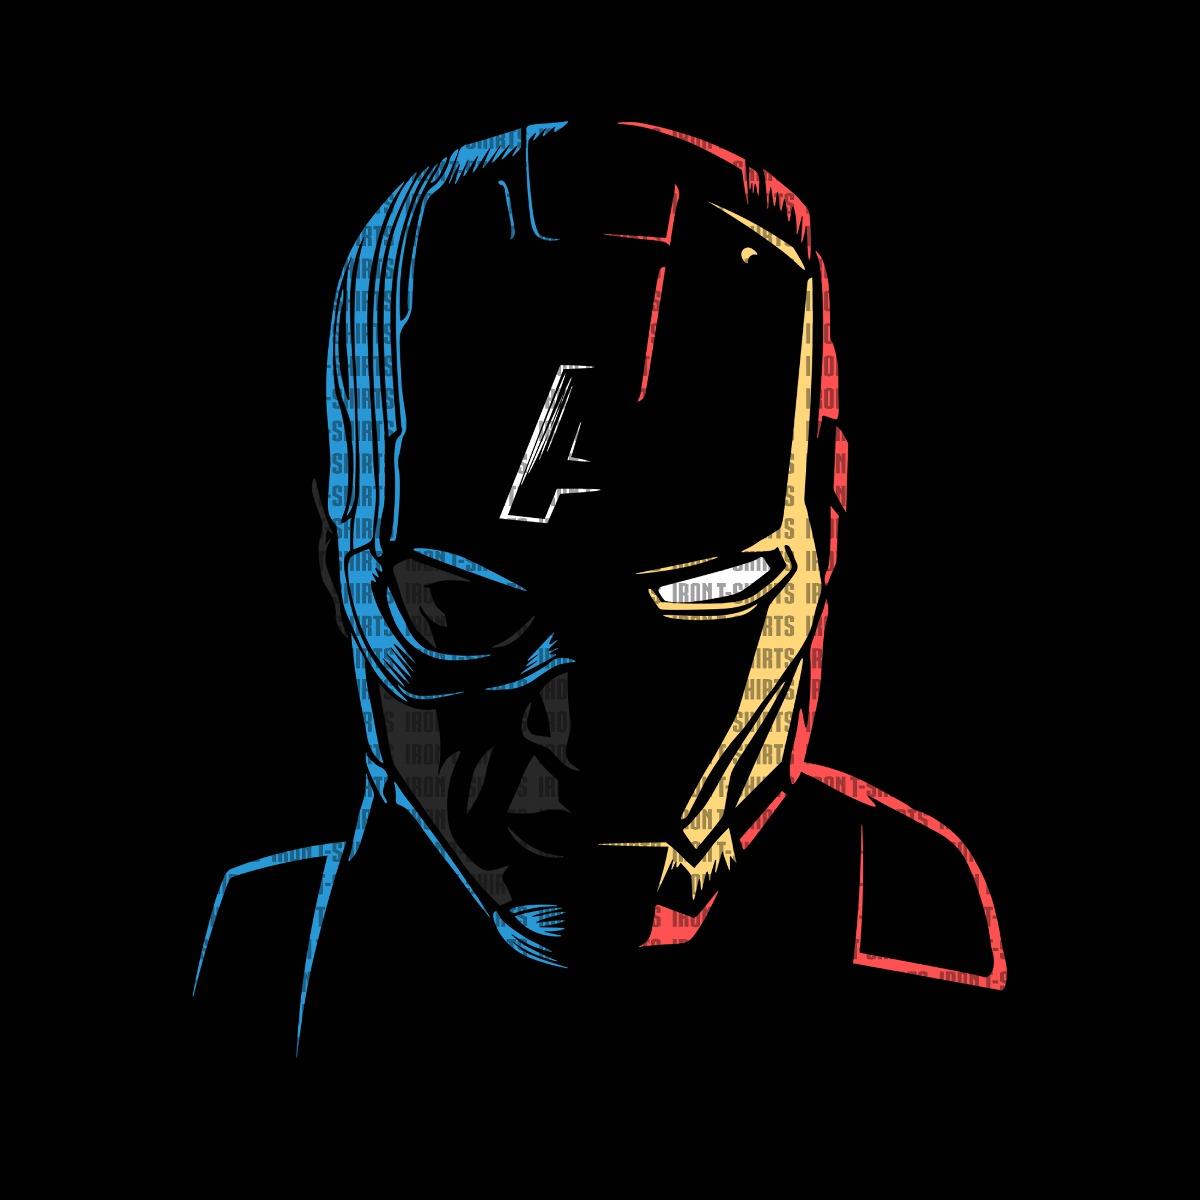 Camiseta Guerra Civil Steve Rogers Tony Stark Geek Nerd R 82 90